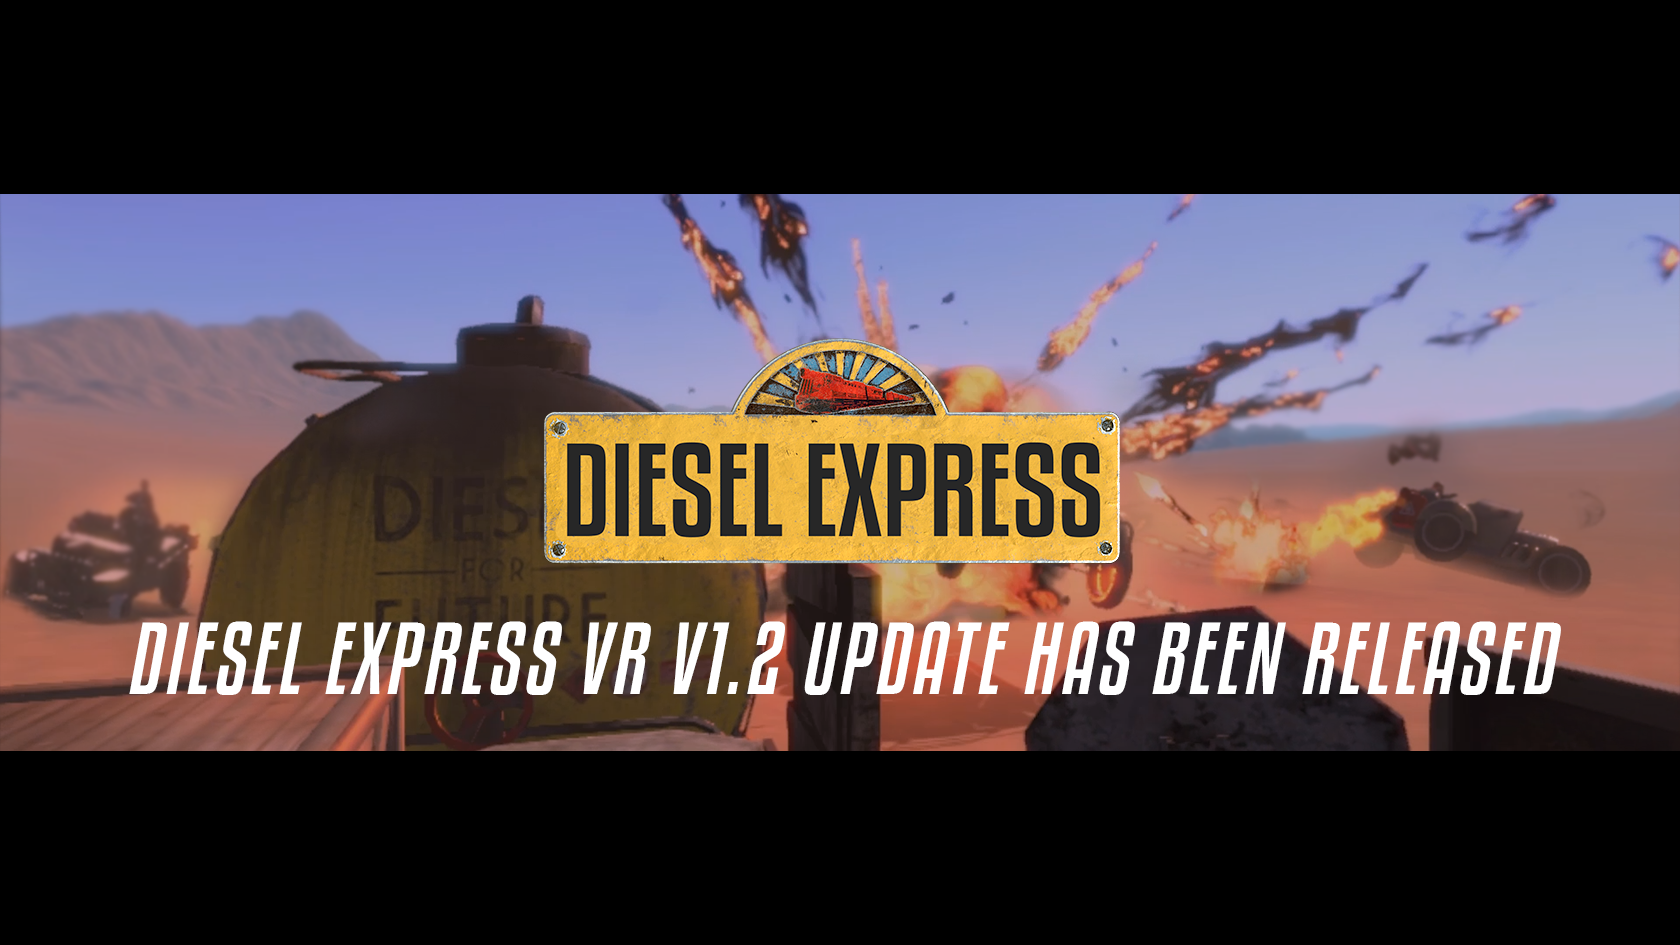 Diesel Express v1.2 update